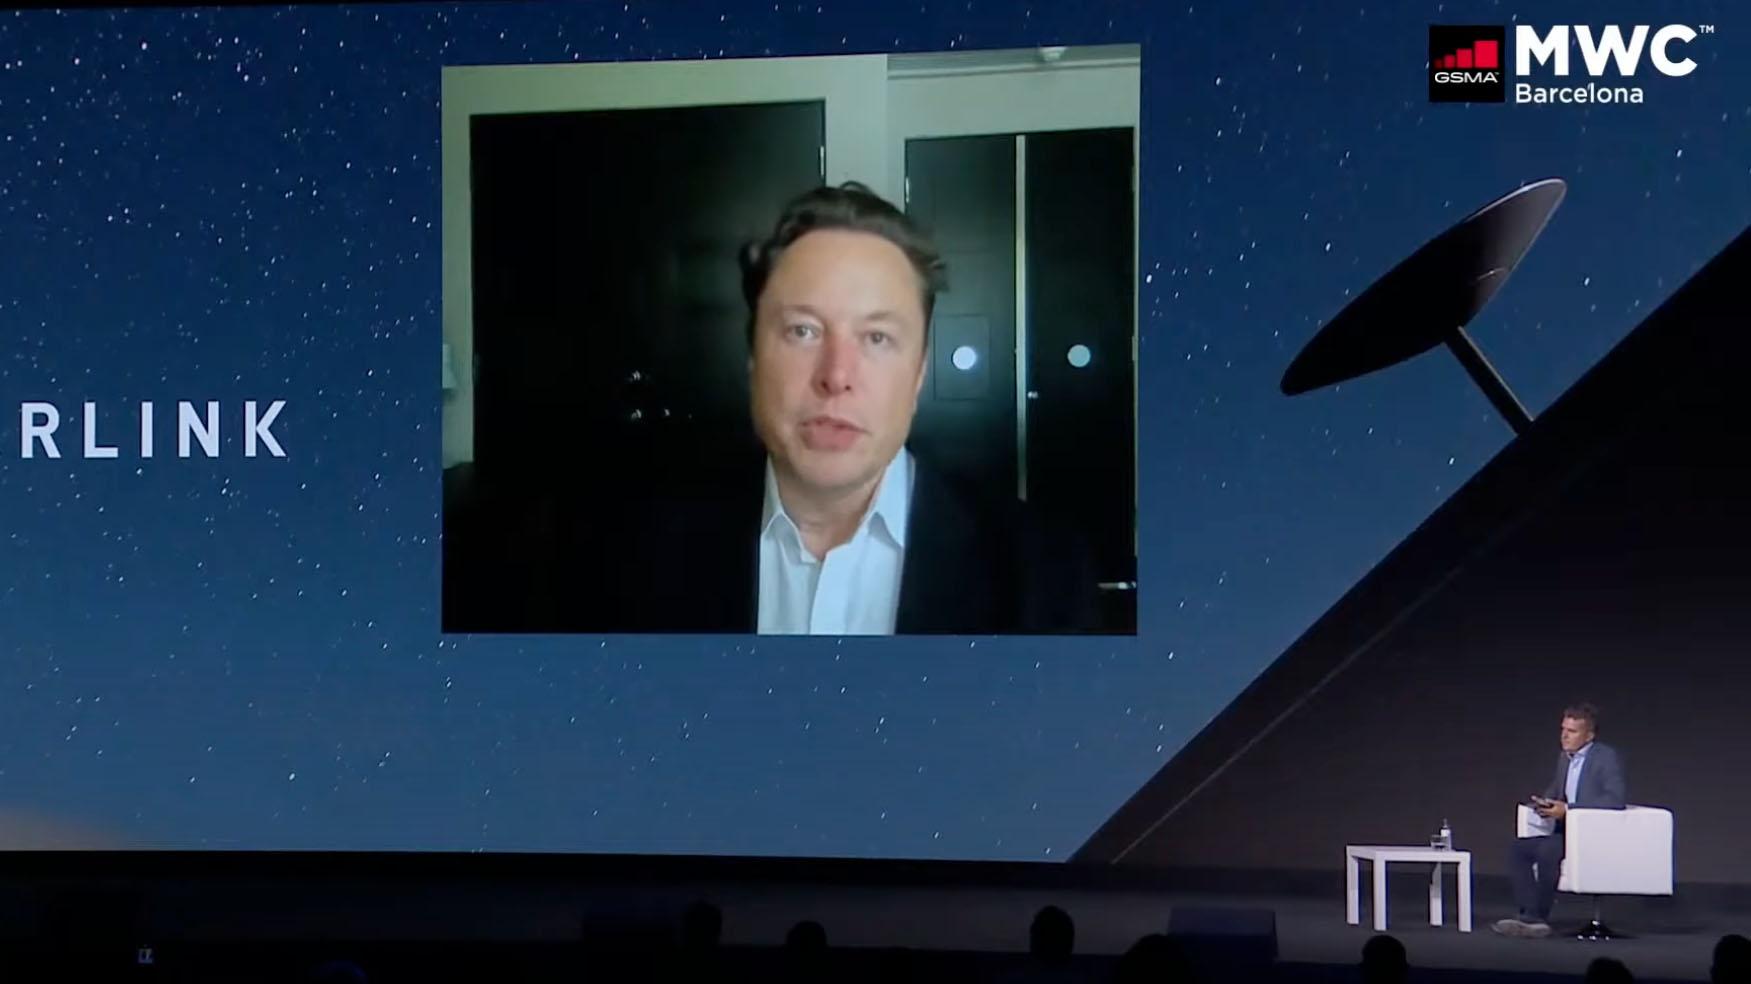 Elon Musk at MWC